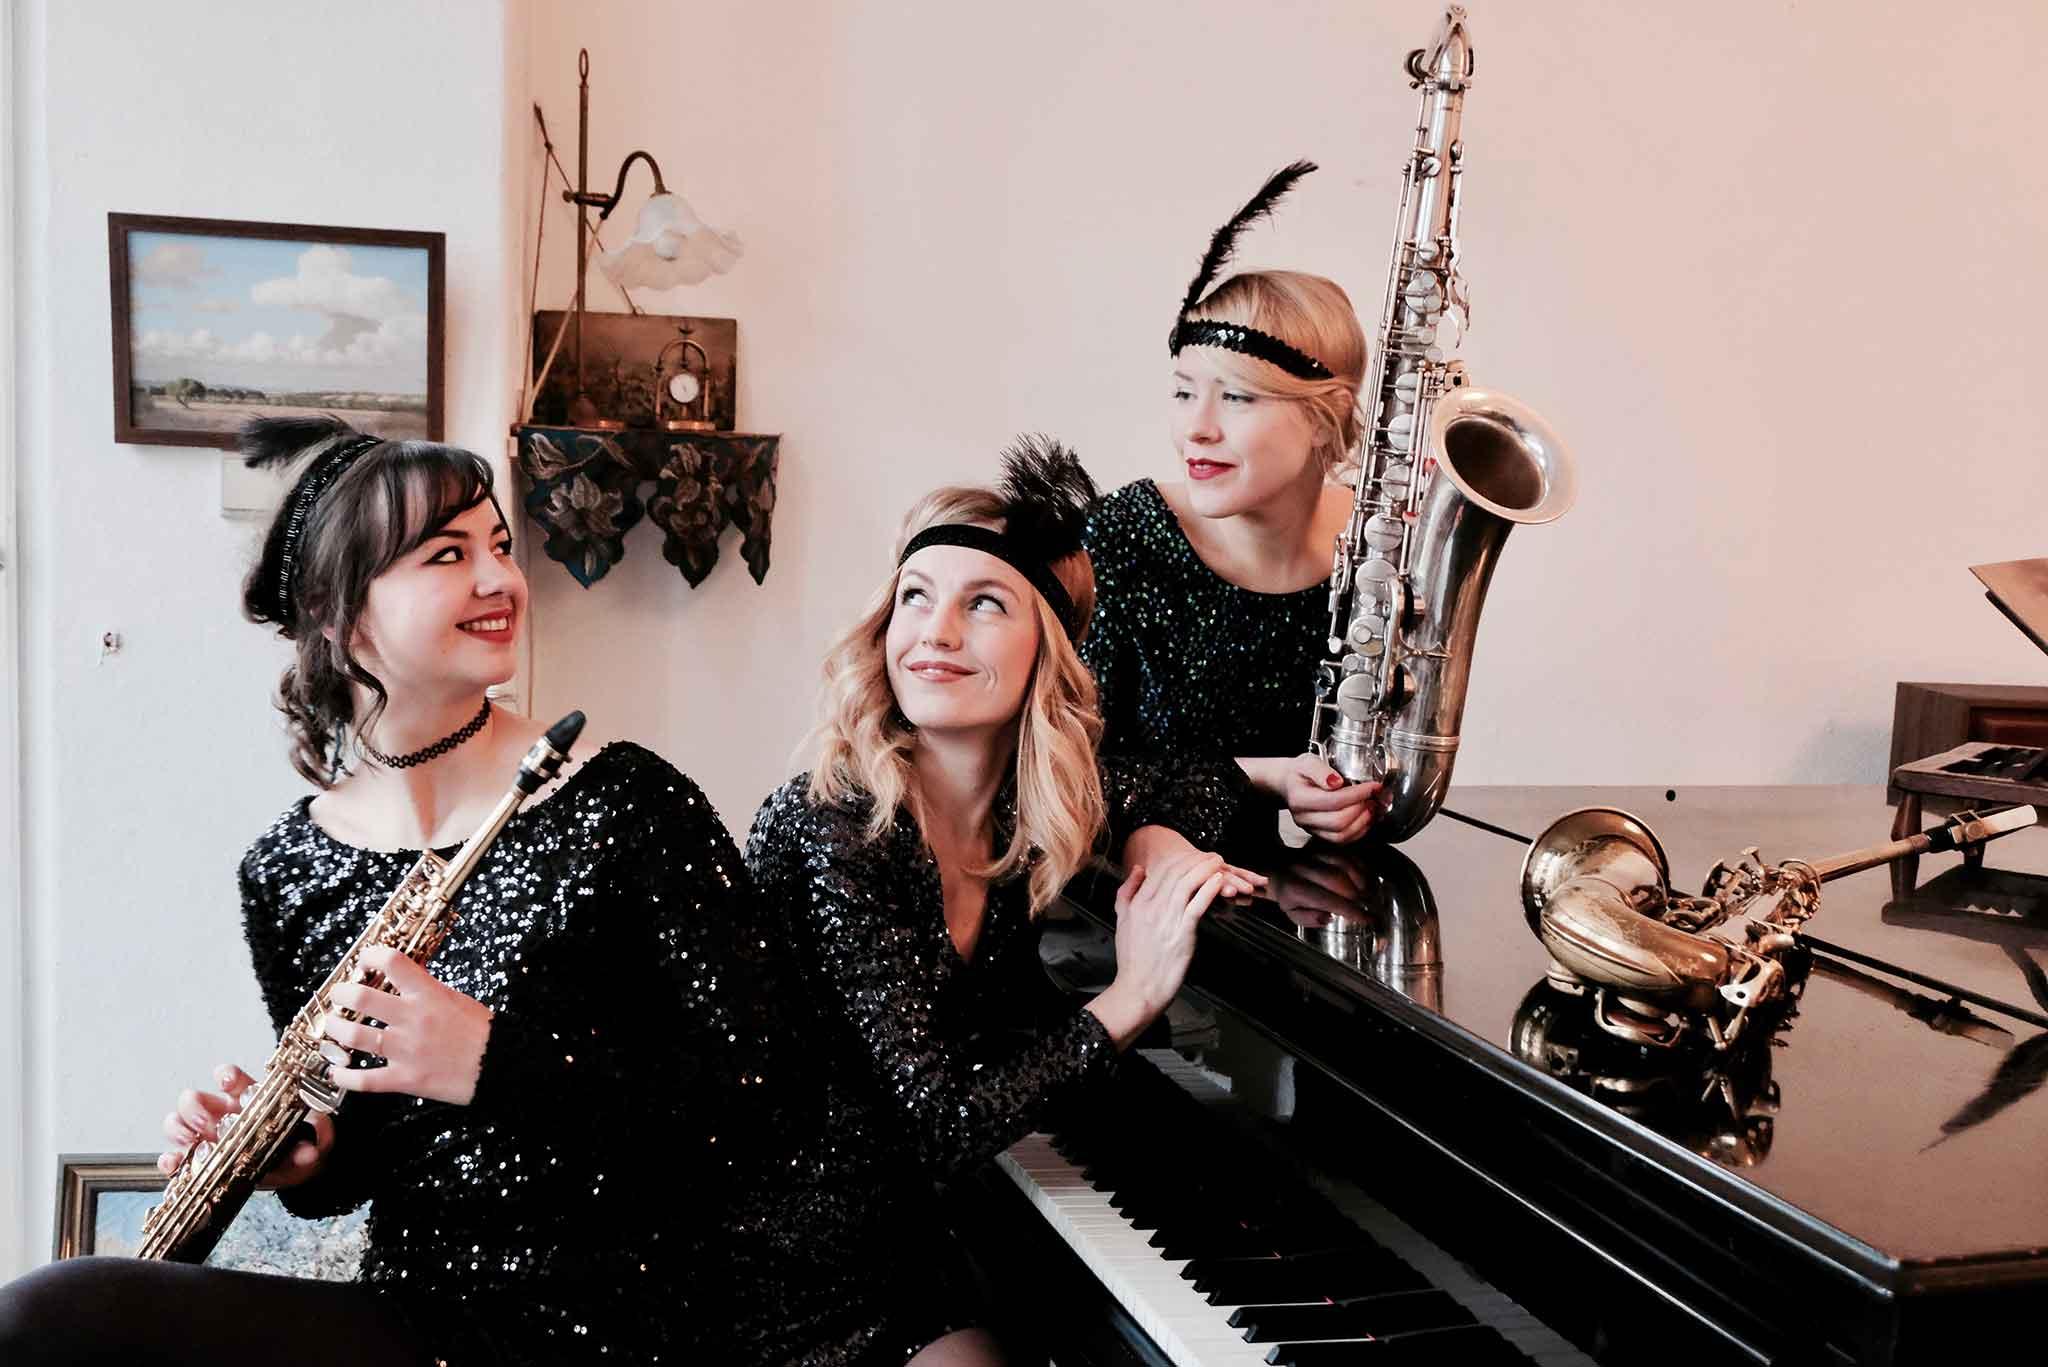 Die Swingband MOON GLOW spielt mit drei Saxophonistinnen Swingmusik